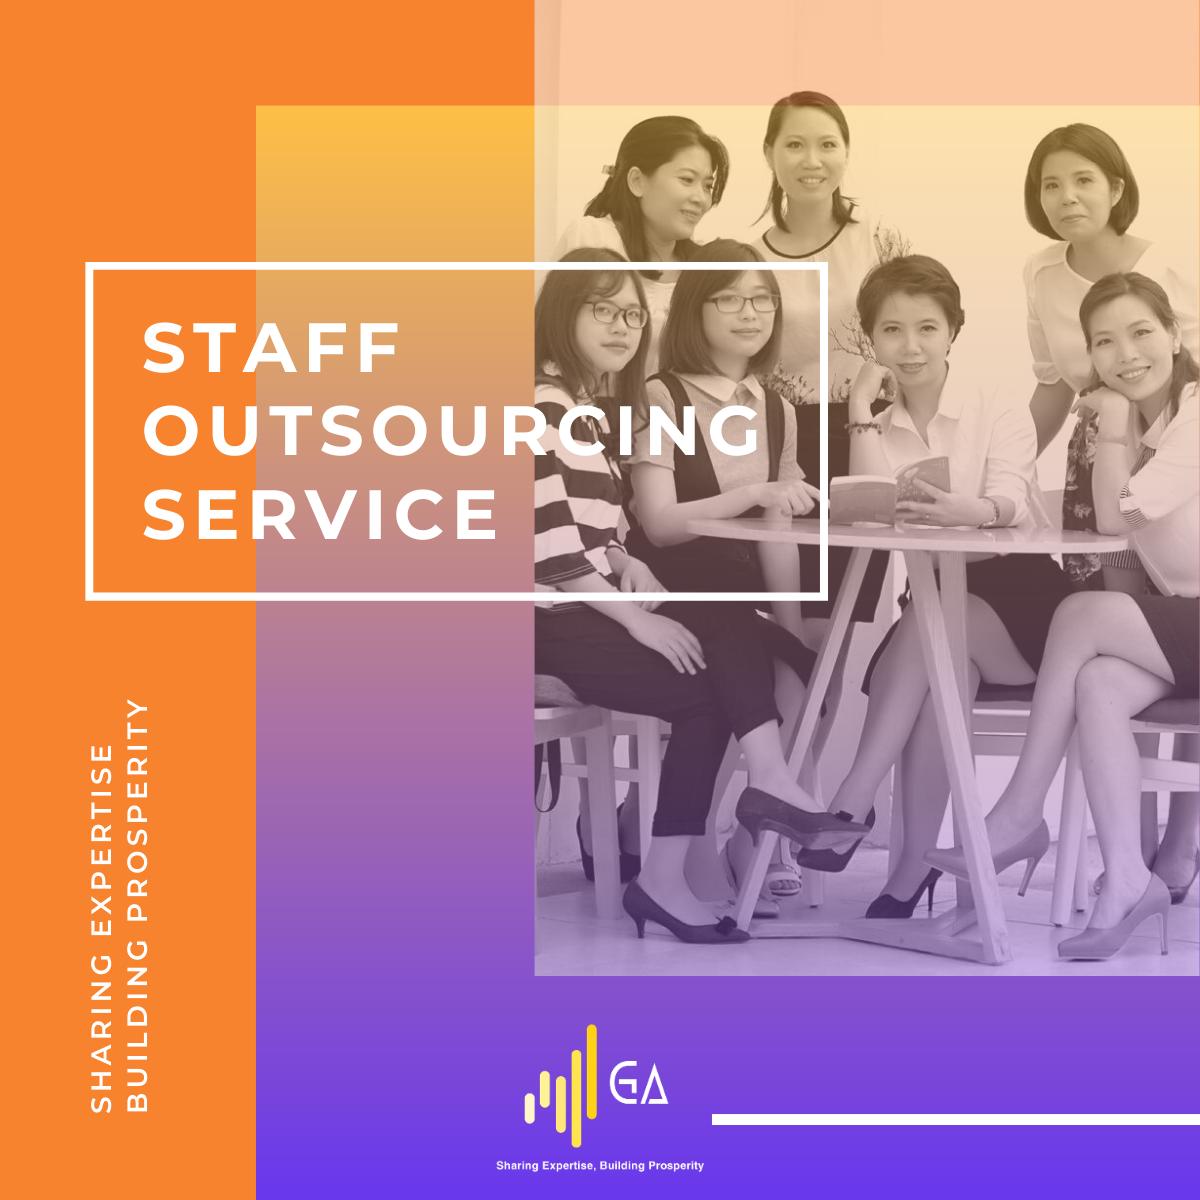 staff outsourcing bpo service ga advisor